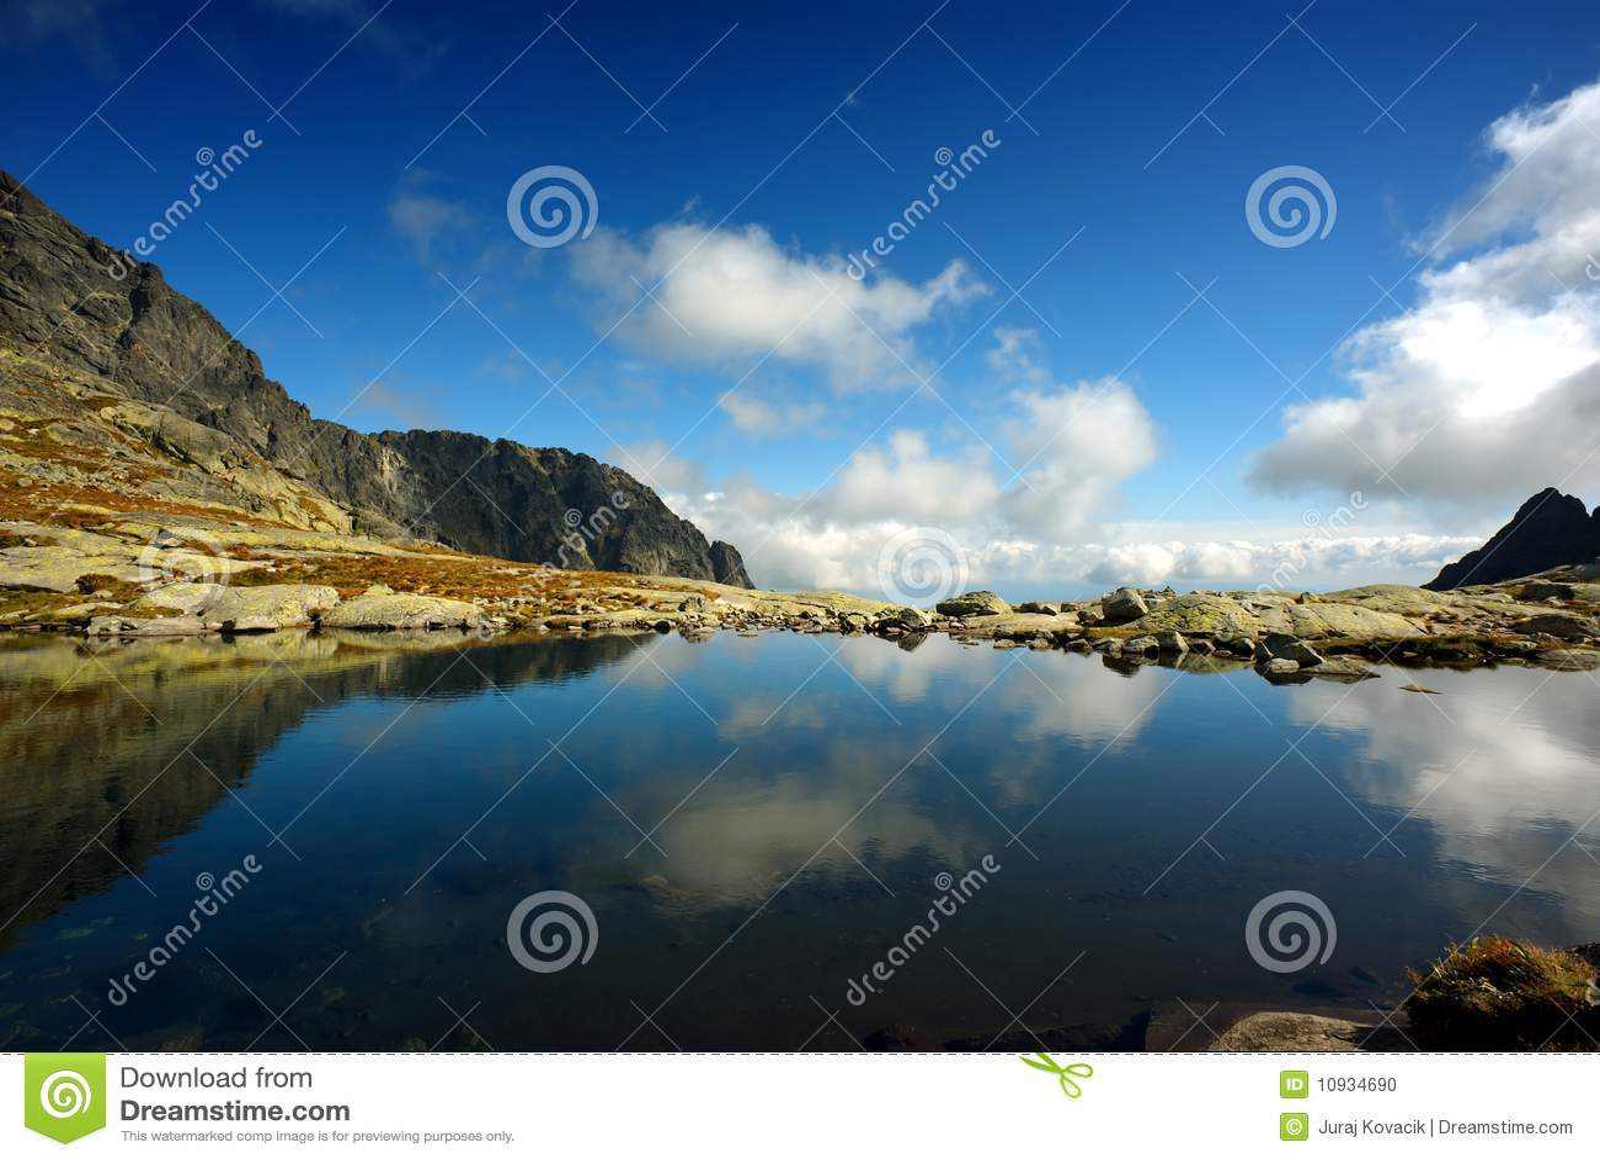 mountains sky lake reflection - photo #7